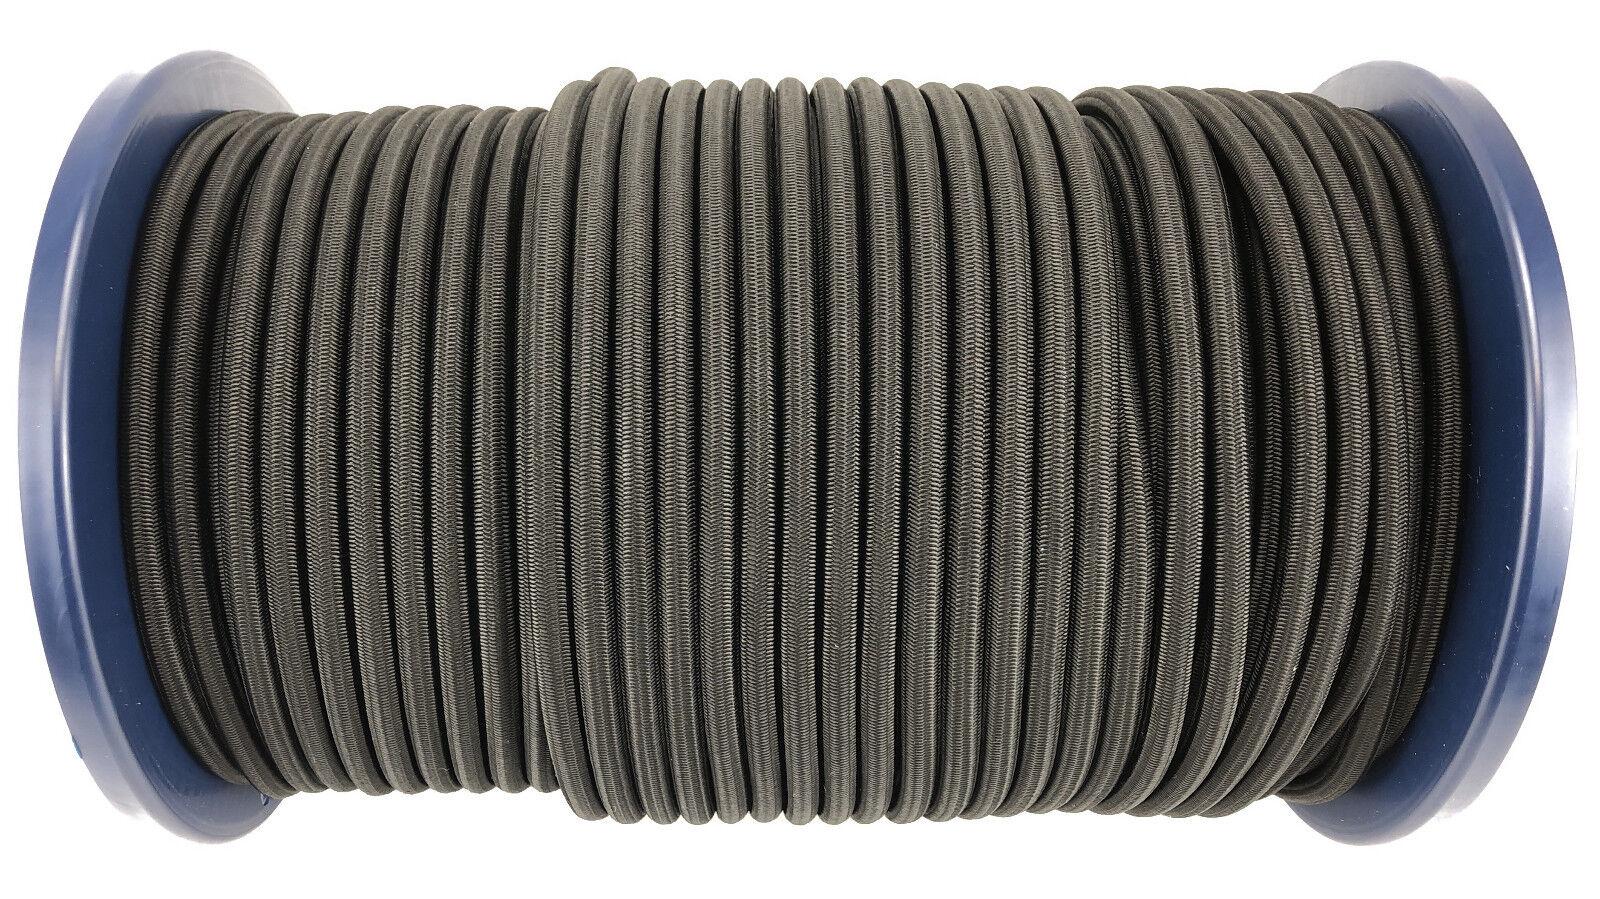 12 mm Anbindung schwarz elastisch Gummi seil. Gummiseil Anbindung mm x 35 M 3ed204